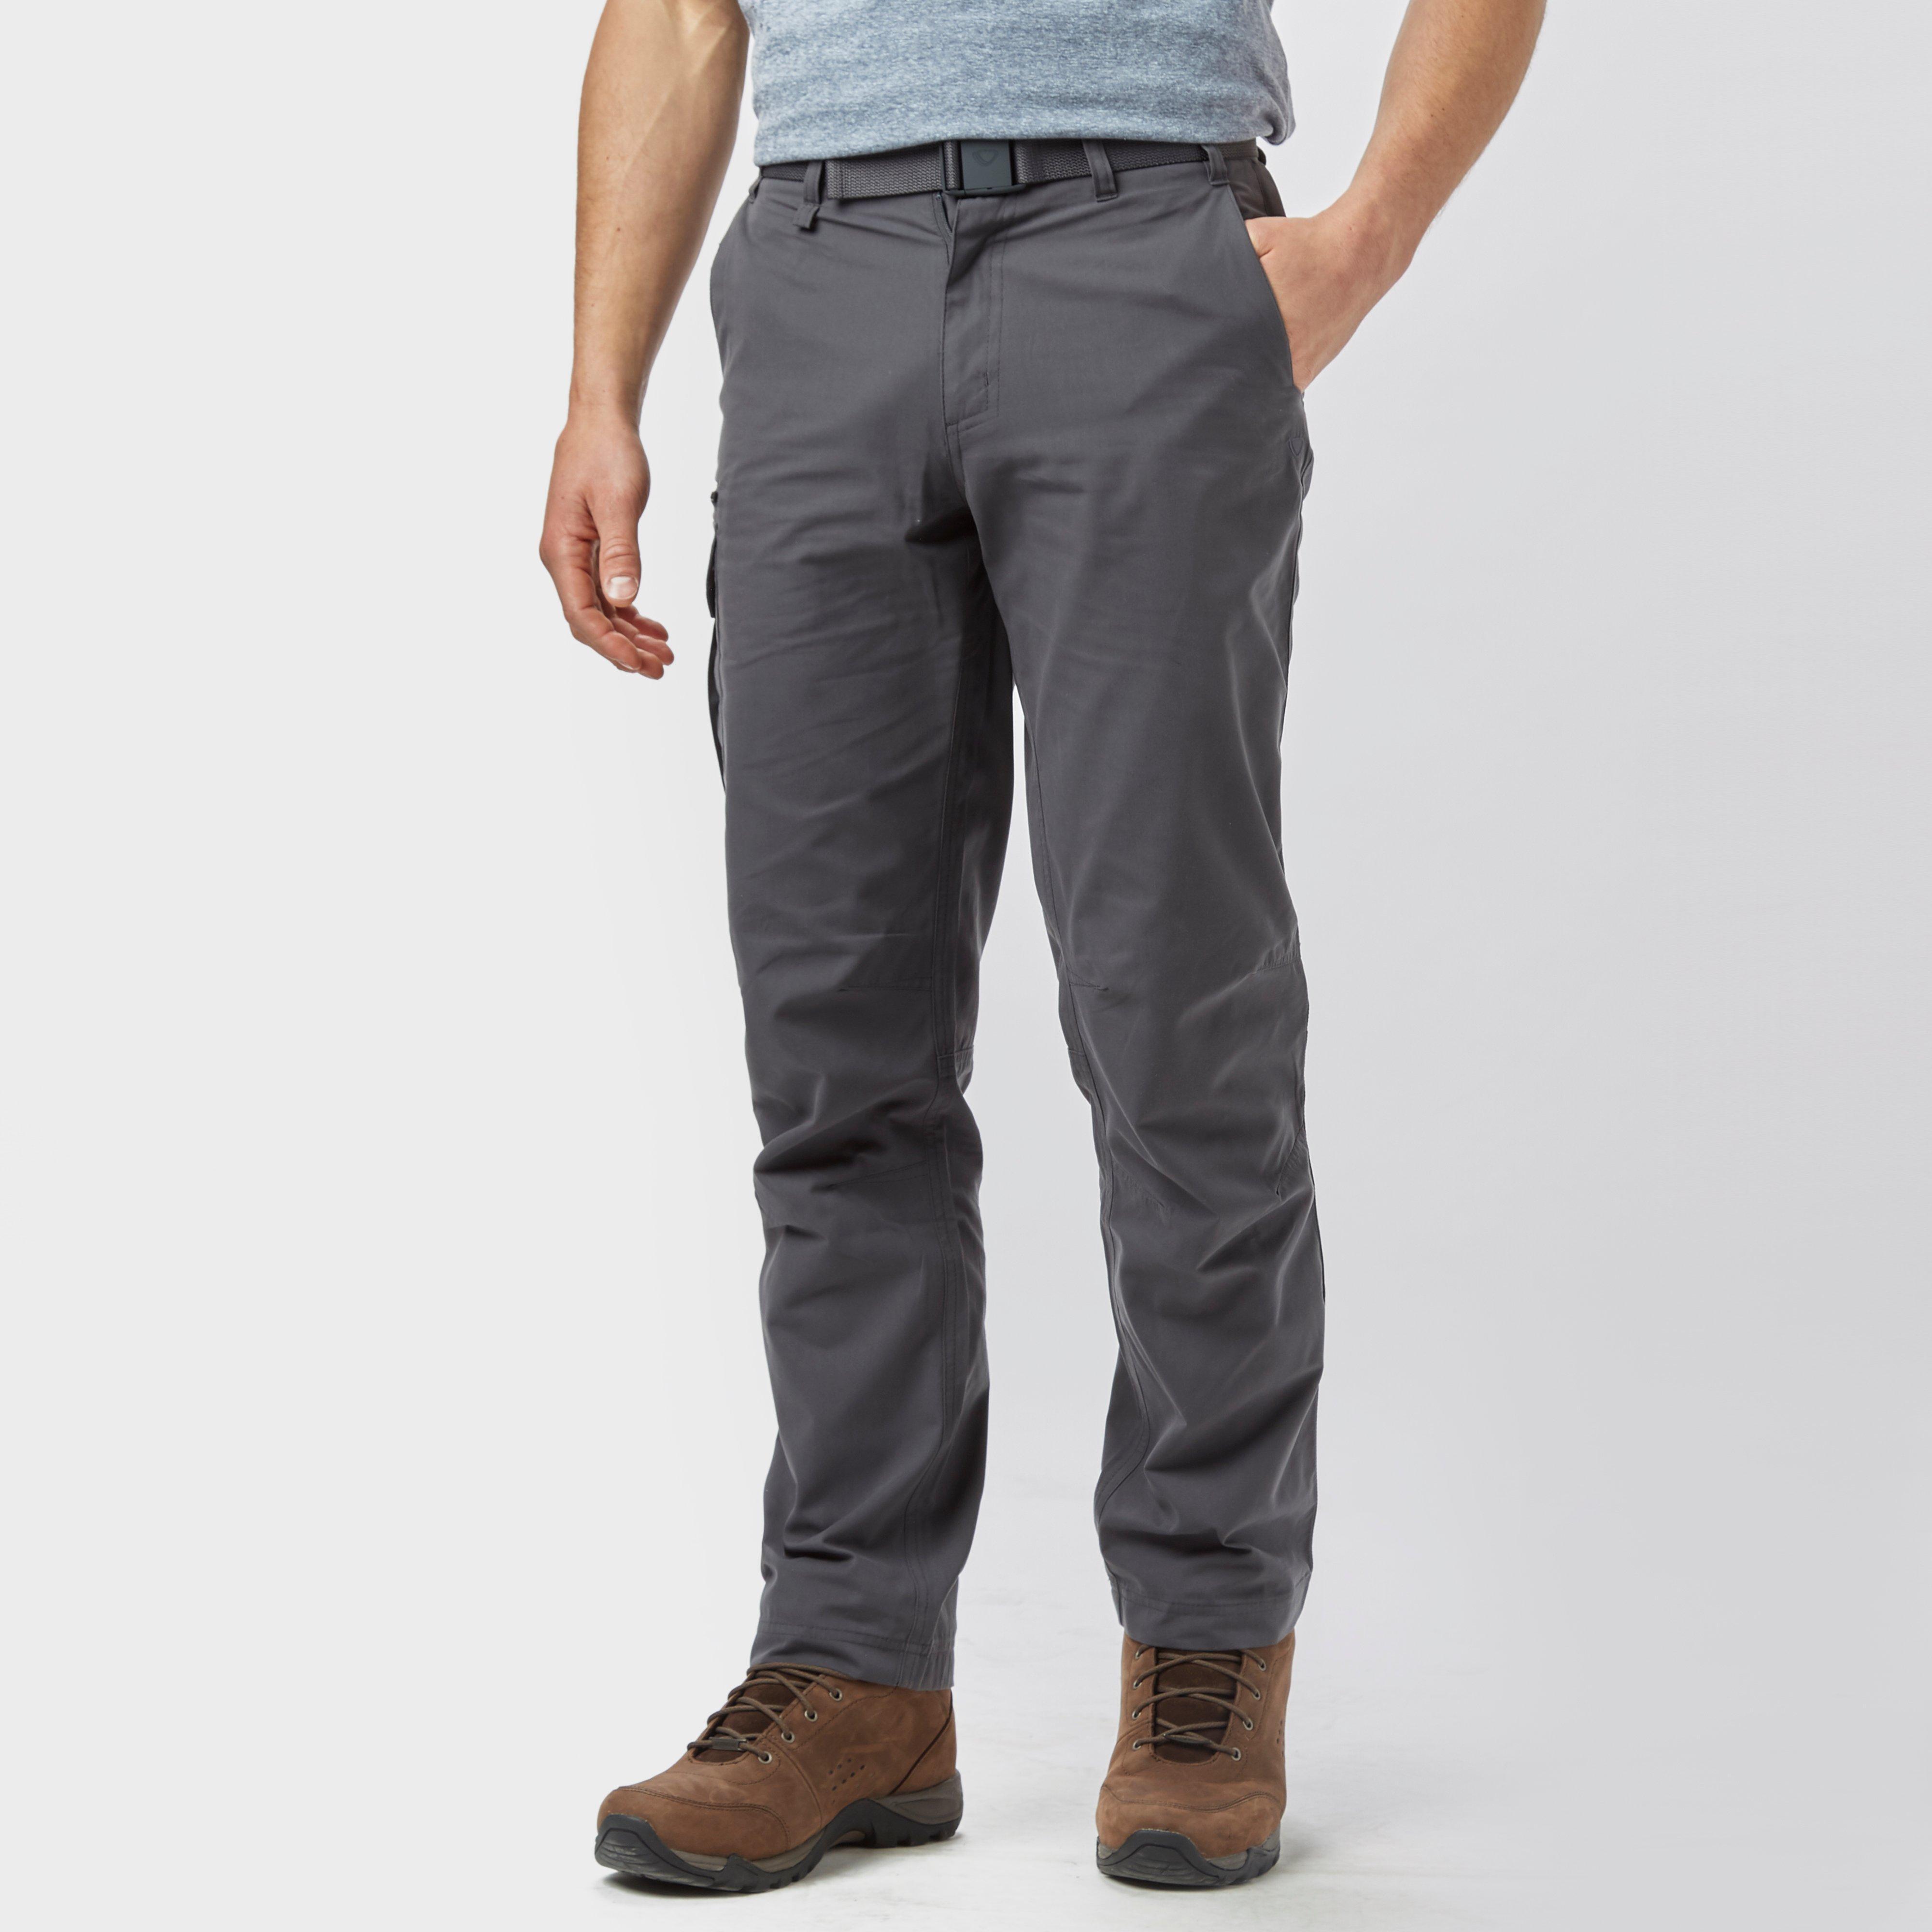 Brasher Mens Walking Trousers - Grey/mgy  Grey/mgy